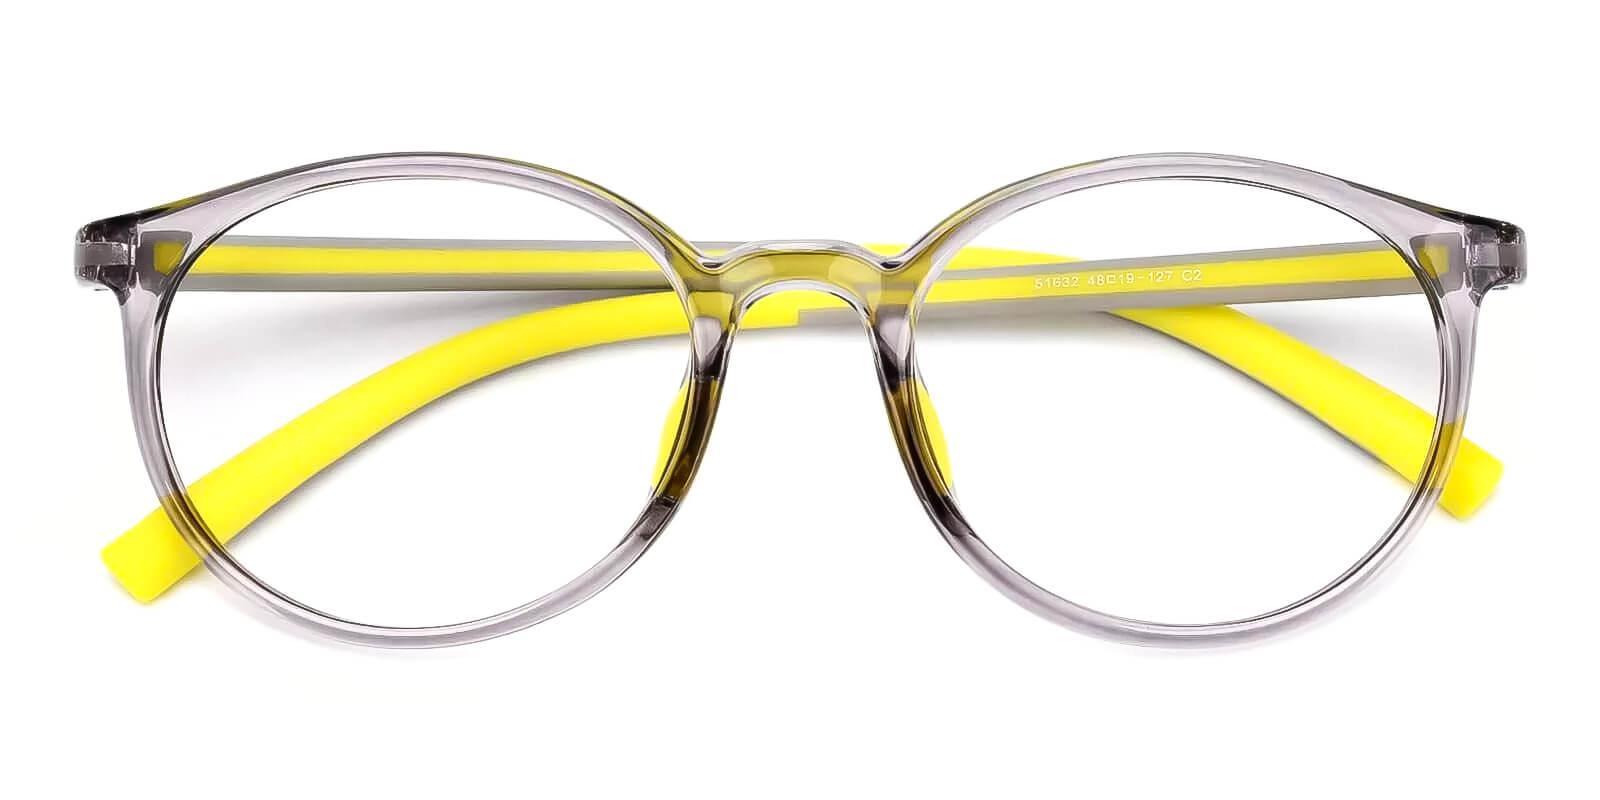 Kids-Momentous Gray Plastic Eyeglasses , Fashion , UniversalBridgeFit Frames from ABBE Glasses